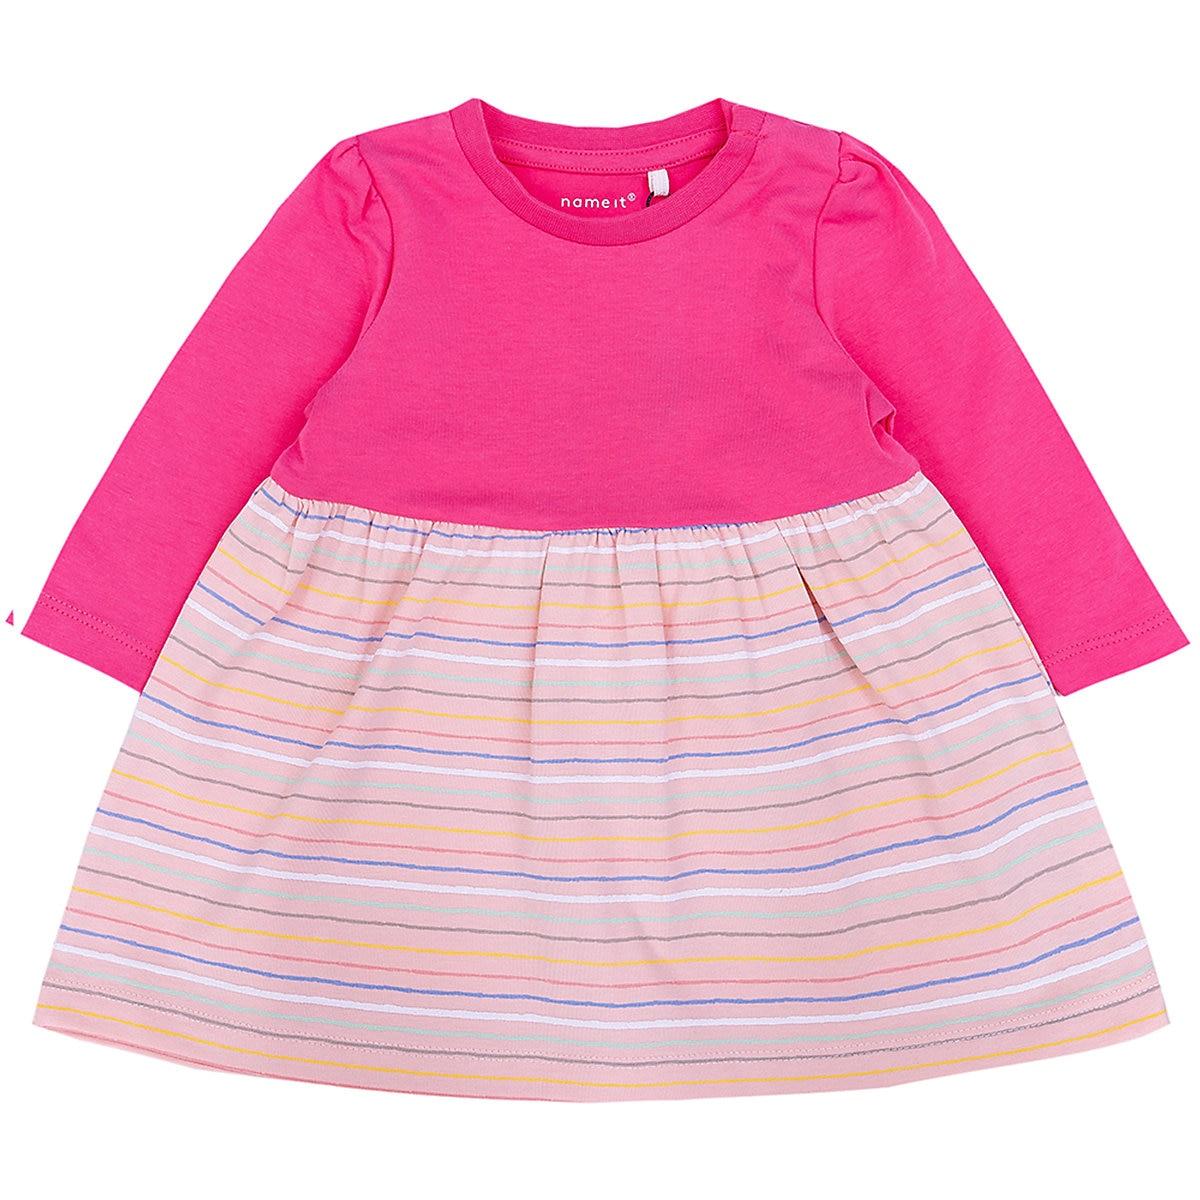 Фото - NAME IT Dresses 11079463 dress for girls baby clothing name it dresses 10626724 dress for girls baby clothing